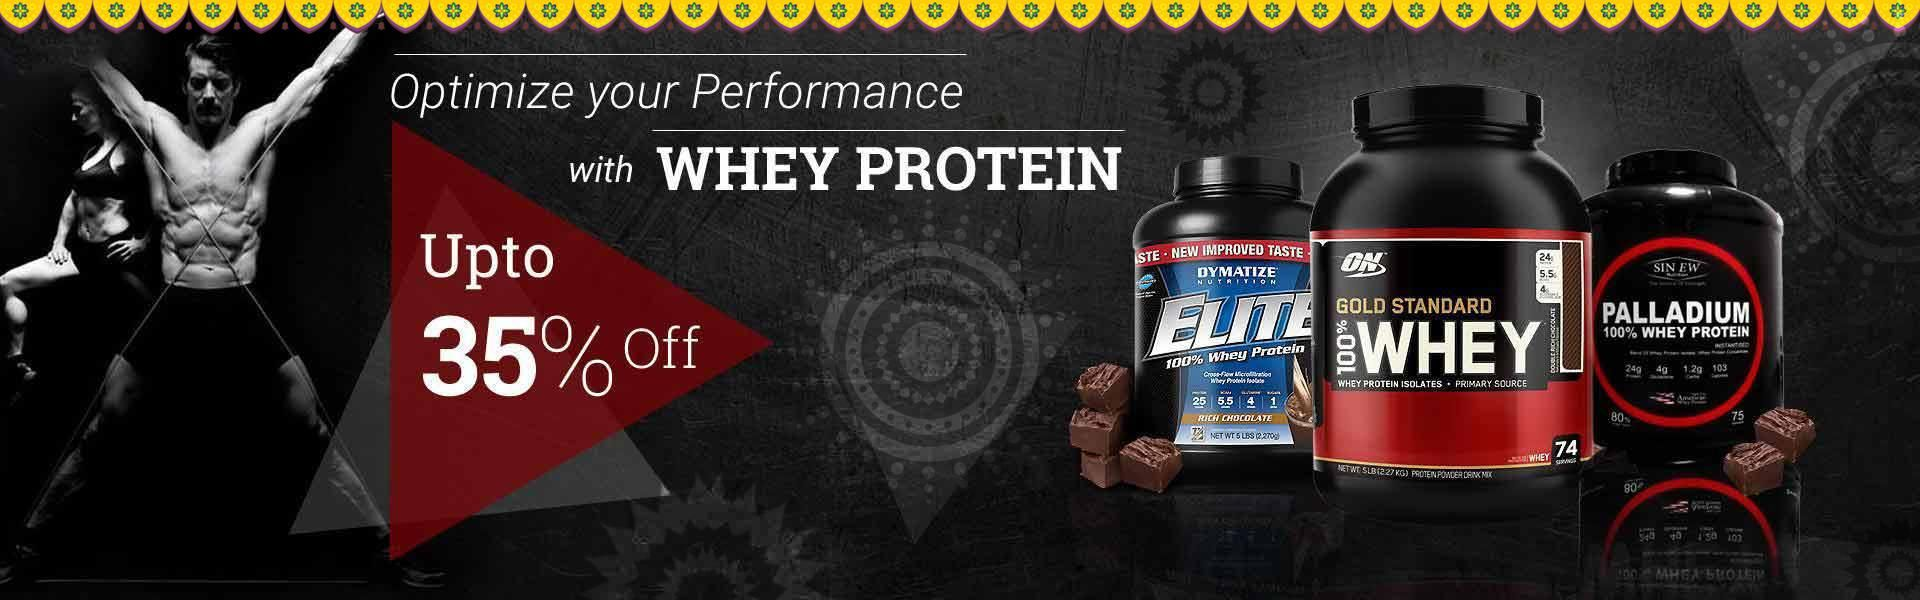 Buy whey protein powder online from healthgenie. Get